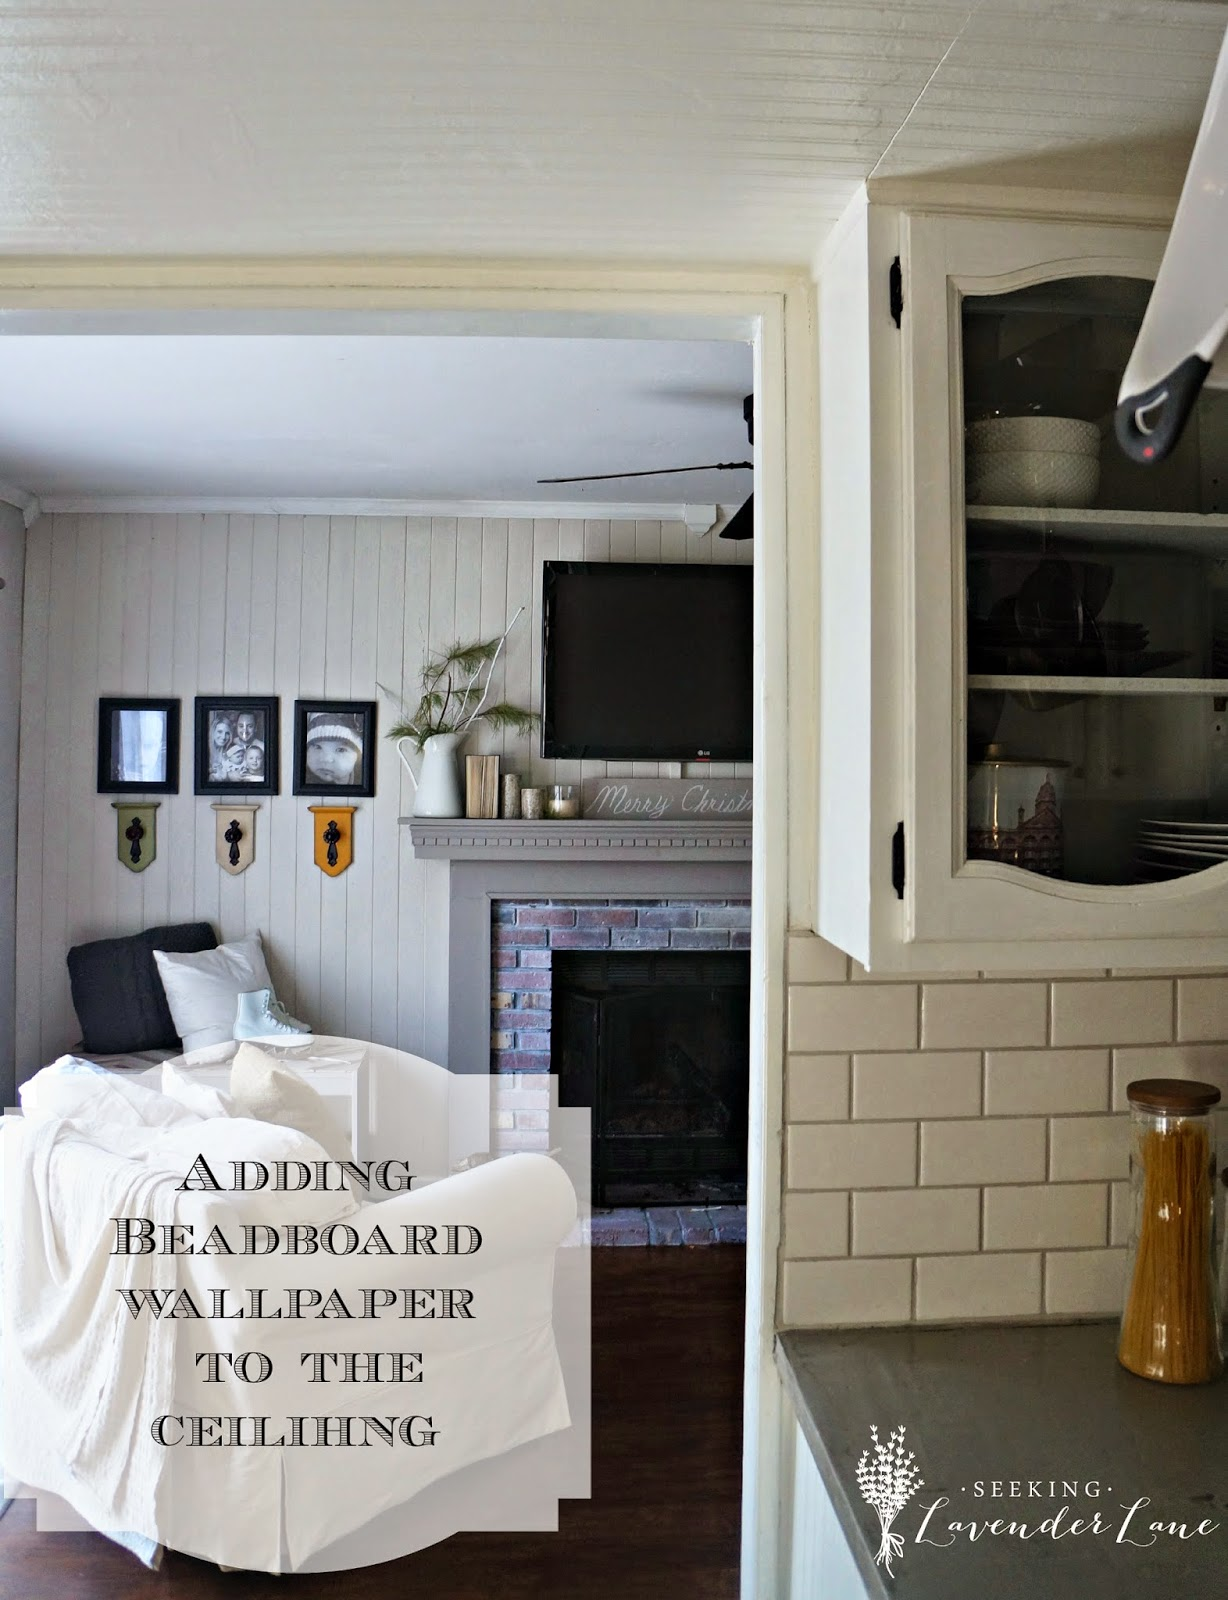 Adding Beadboard Wallpaper to our Kitchen Ceiling - Seeking Lavendar ...